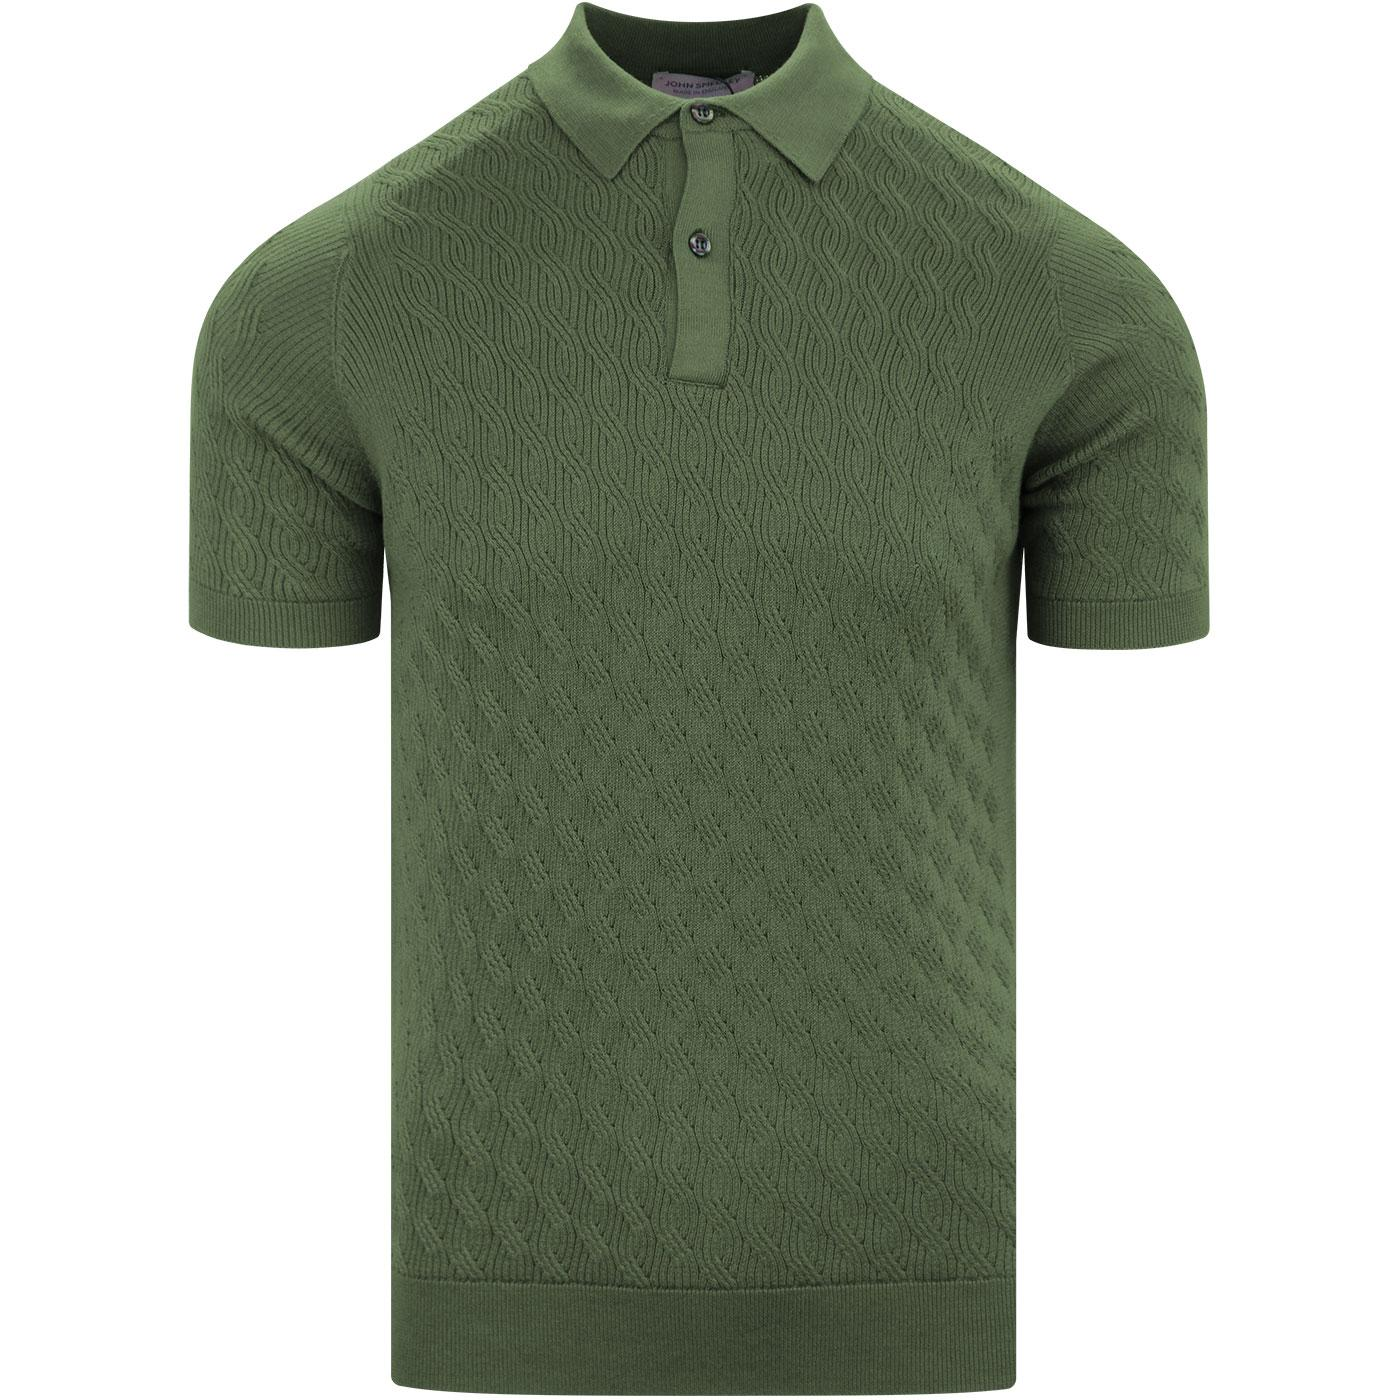 Popplewell JOHN SMEDLEY Cable Knit Polo Shirt (SG)